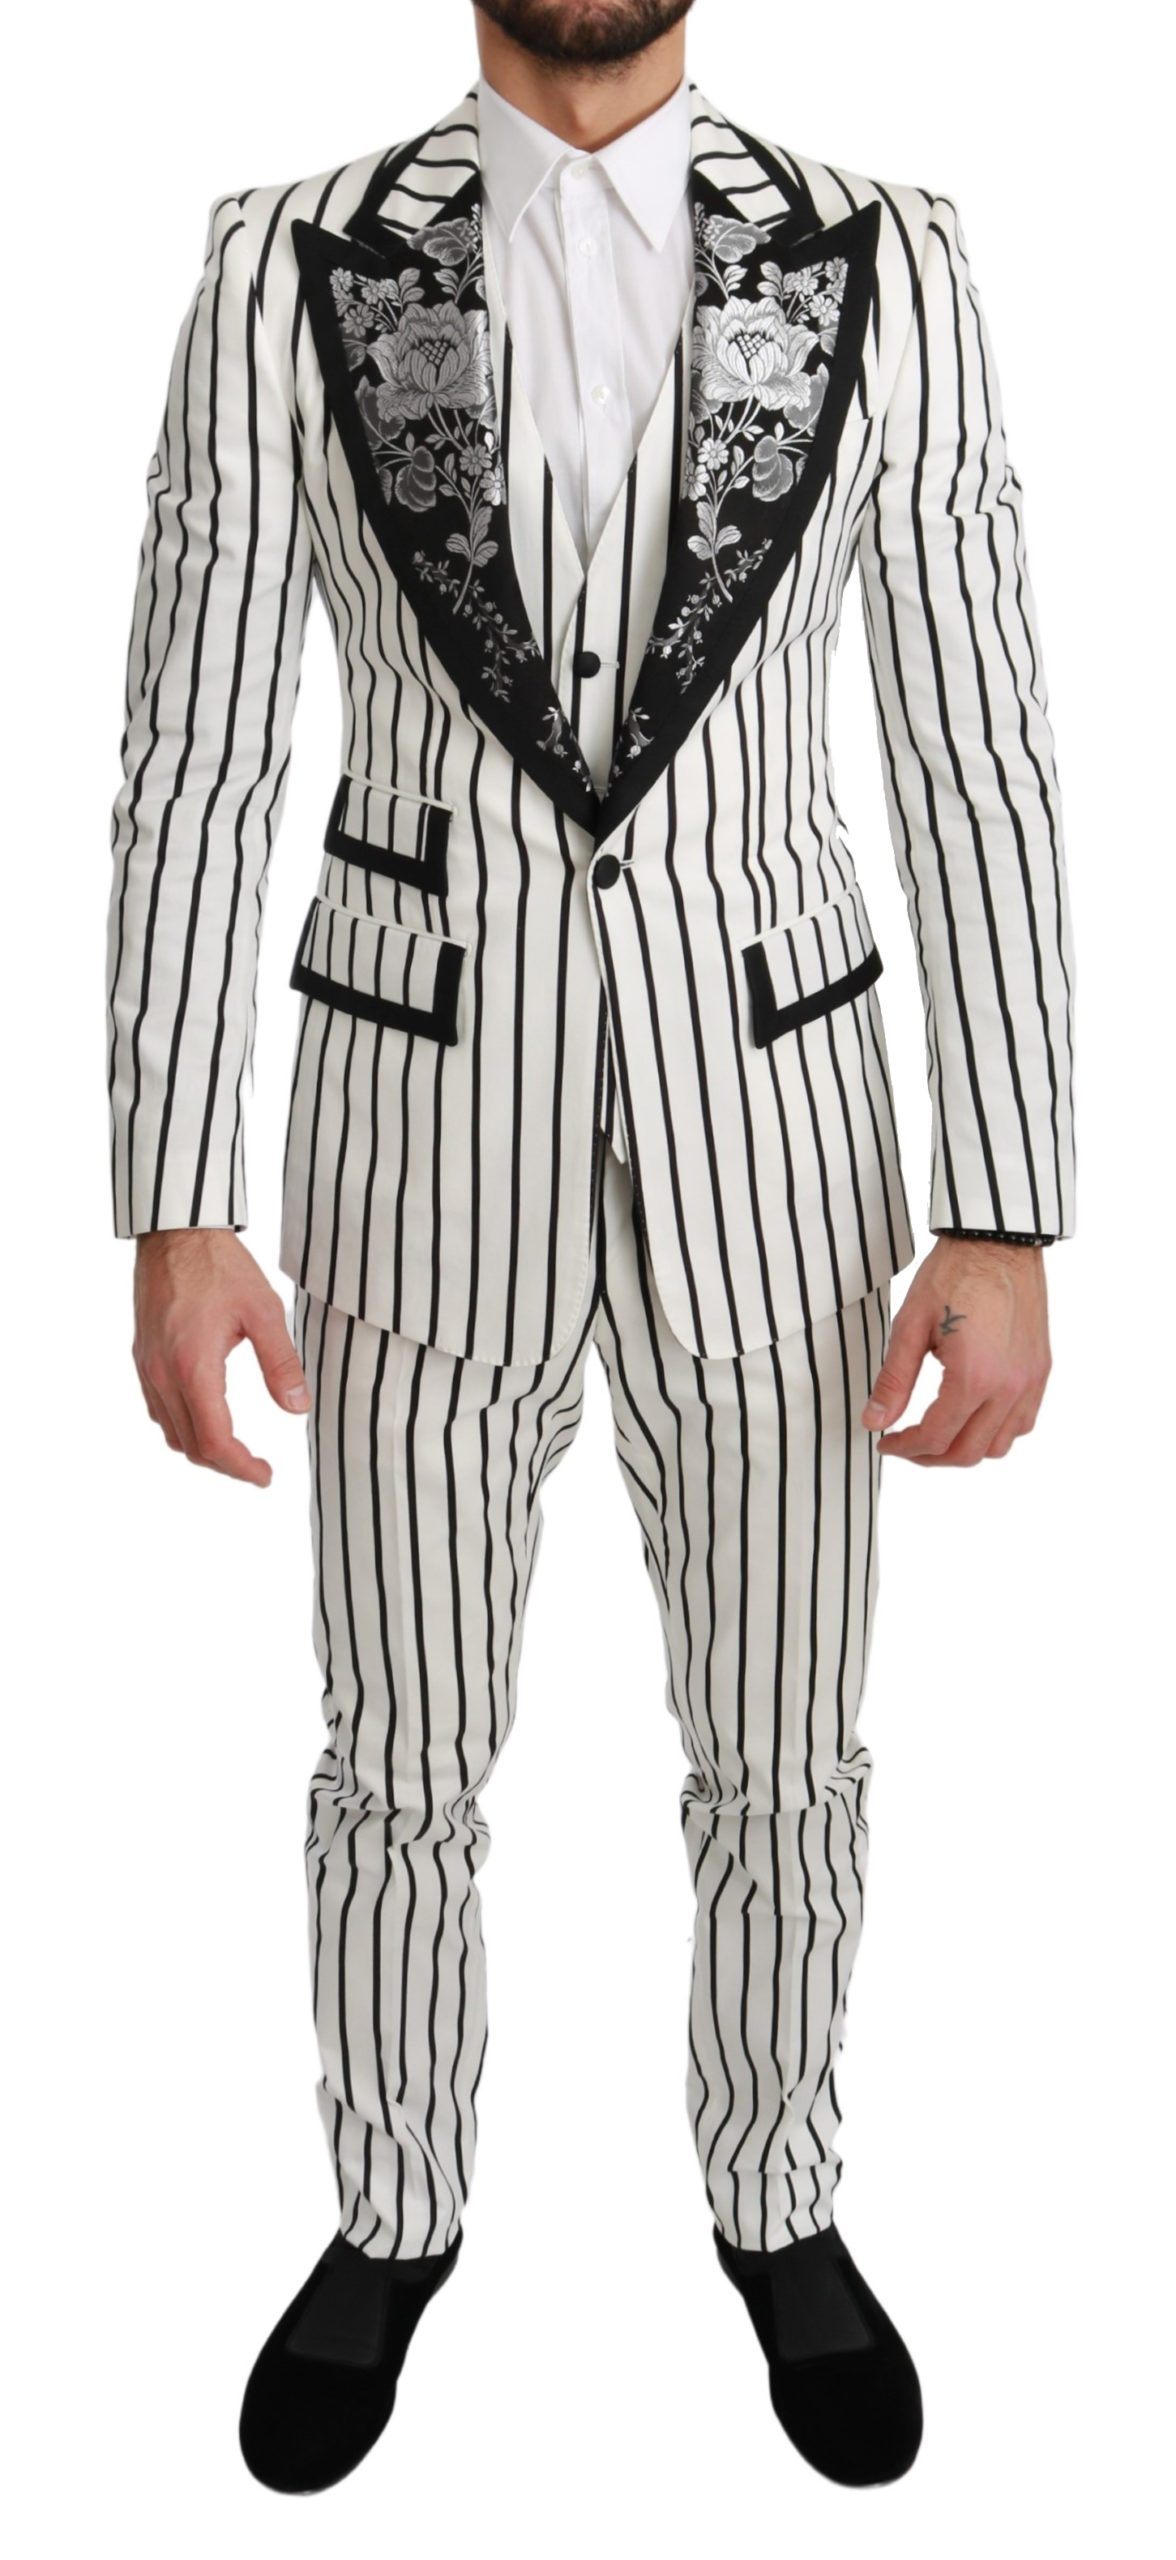 Dolce & Gabbana Men's Striped Floral 3 Piece White Suit White KOS1702 - IT46   S